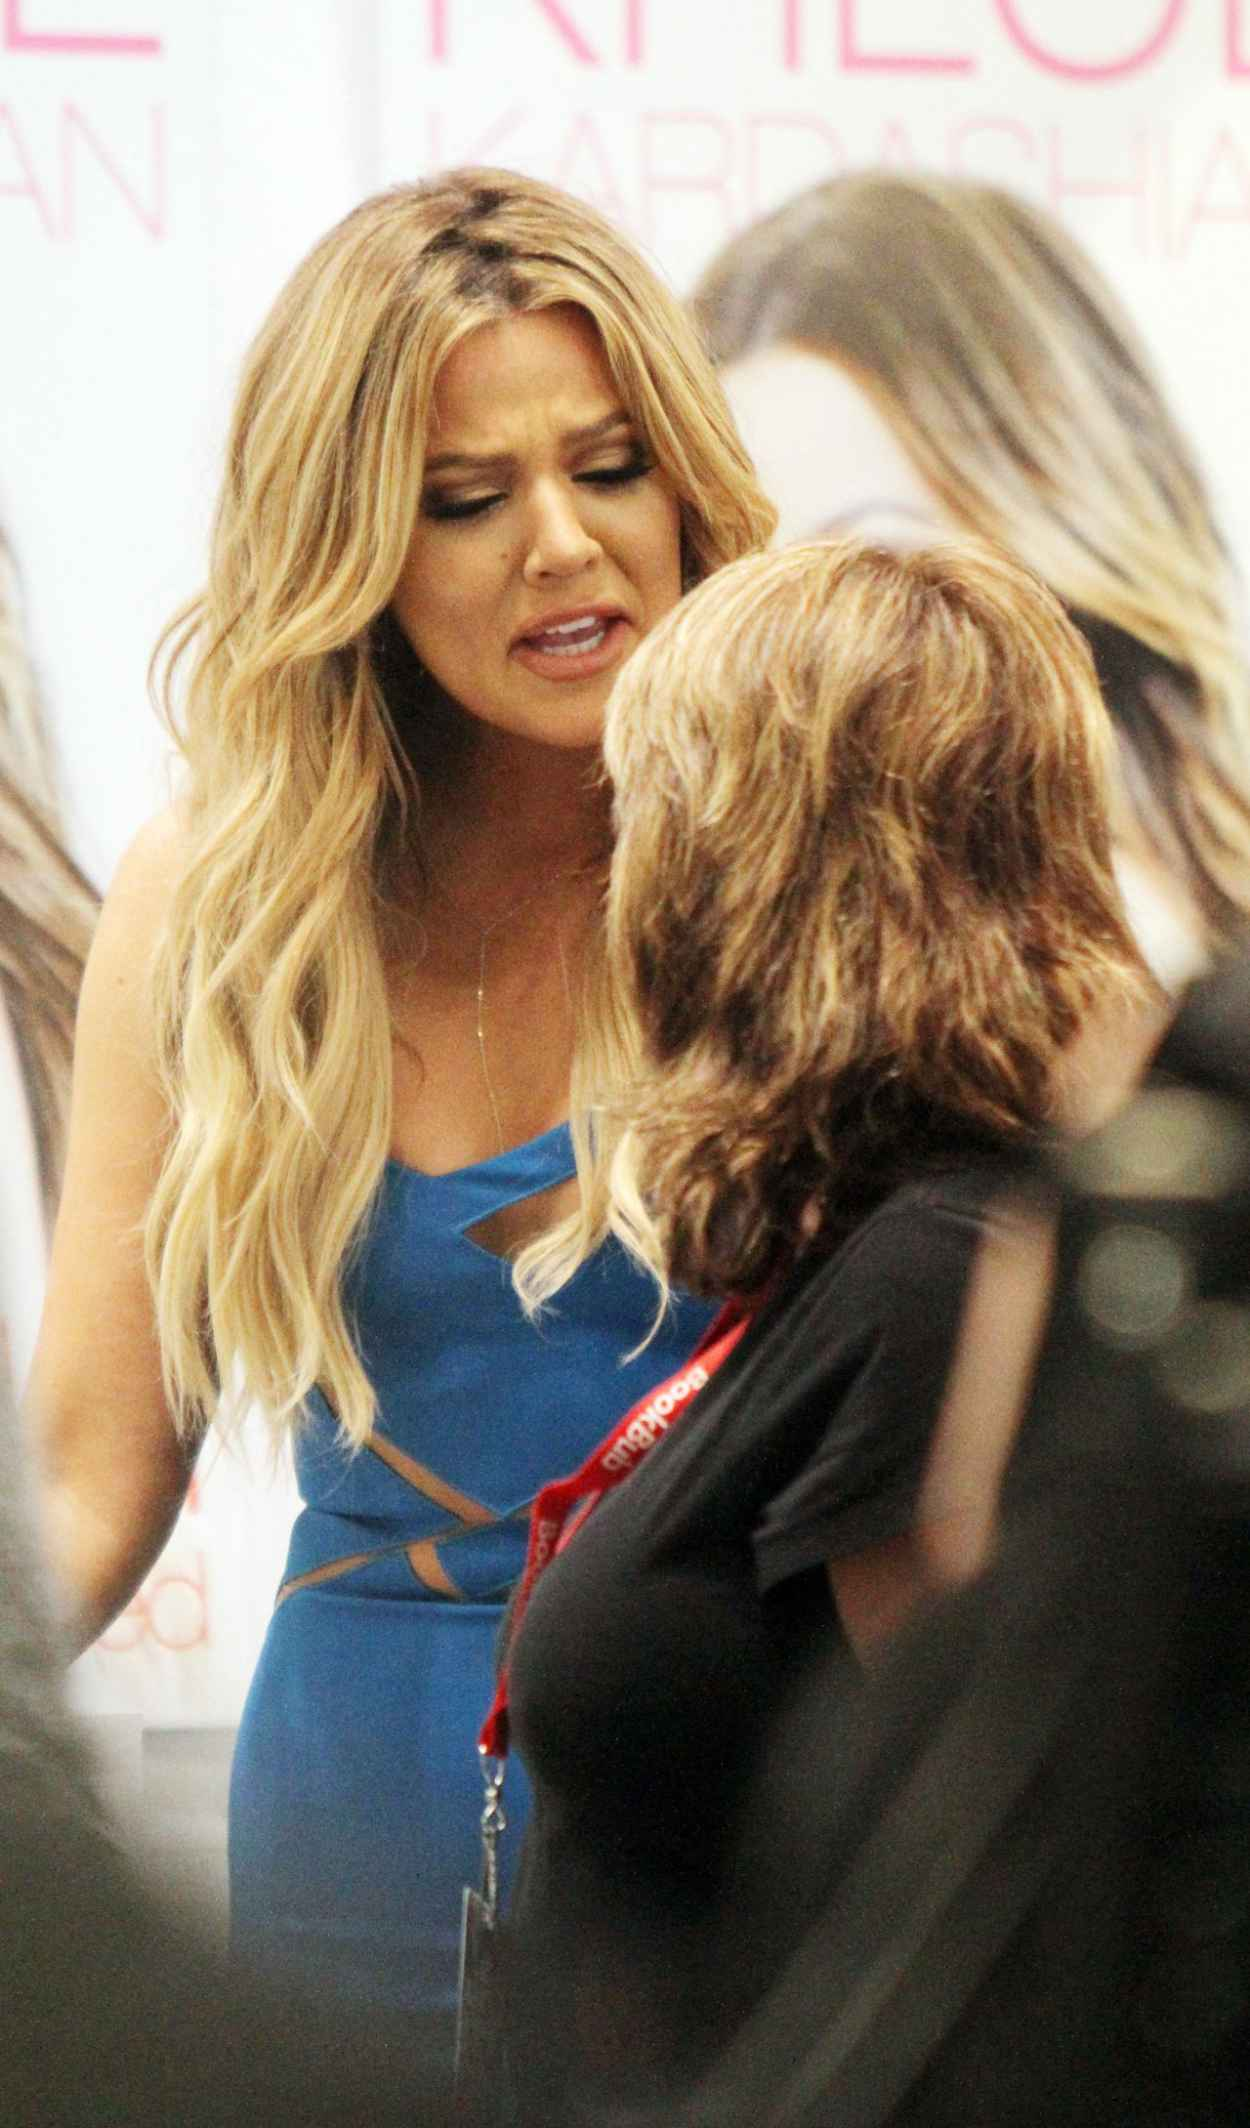 Khloe Kardashian - BookCon in New York City, May 2015-2